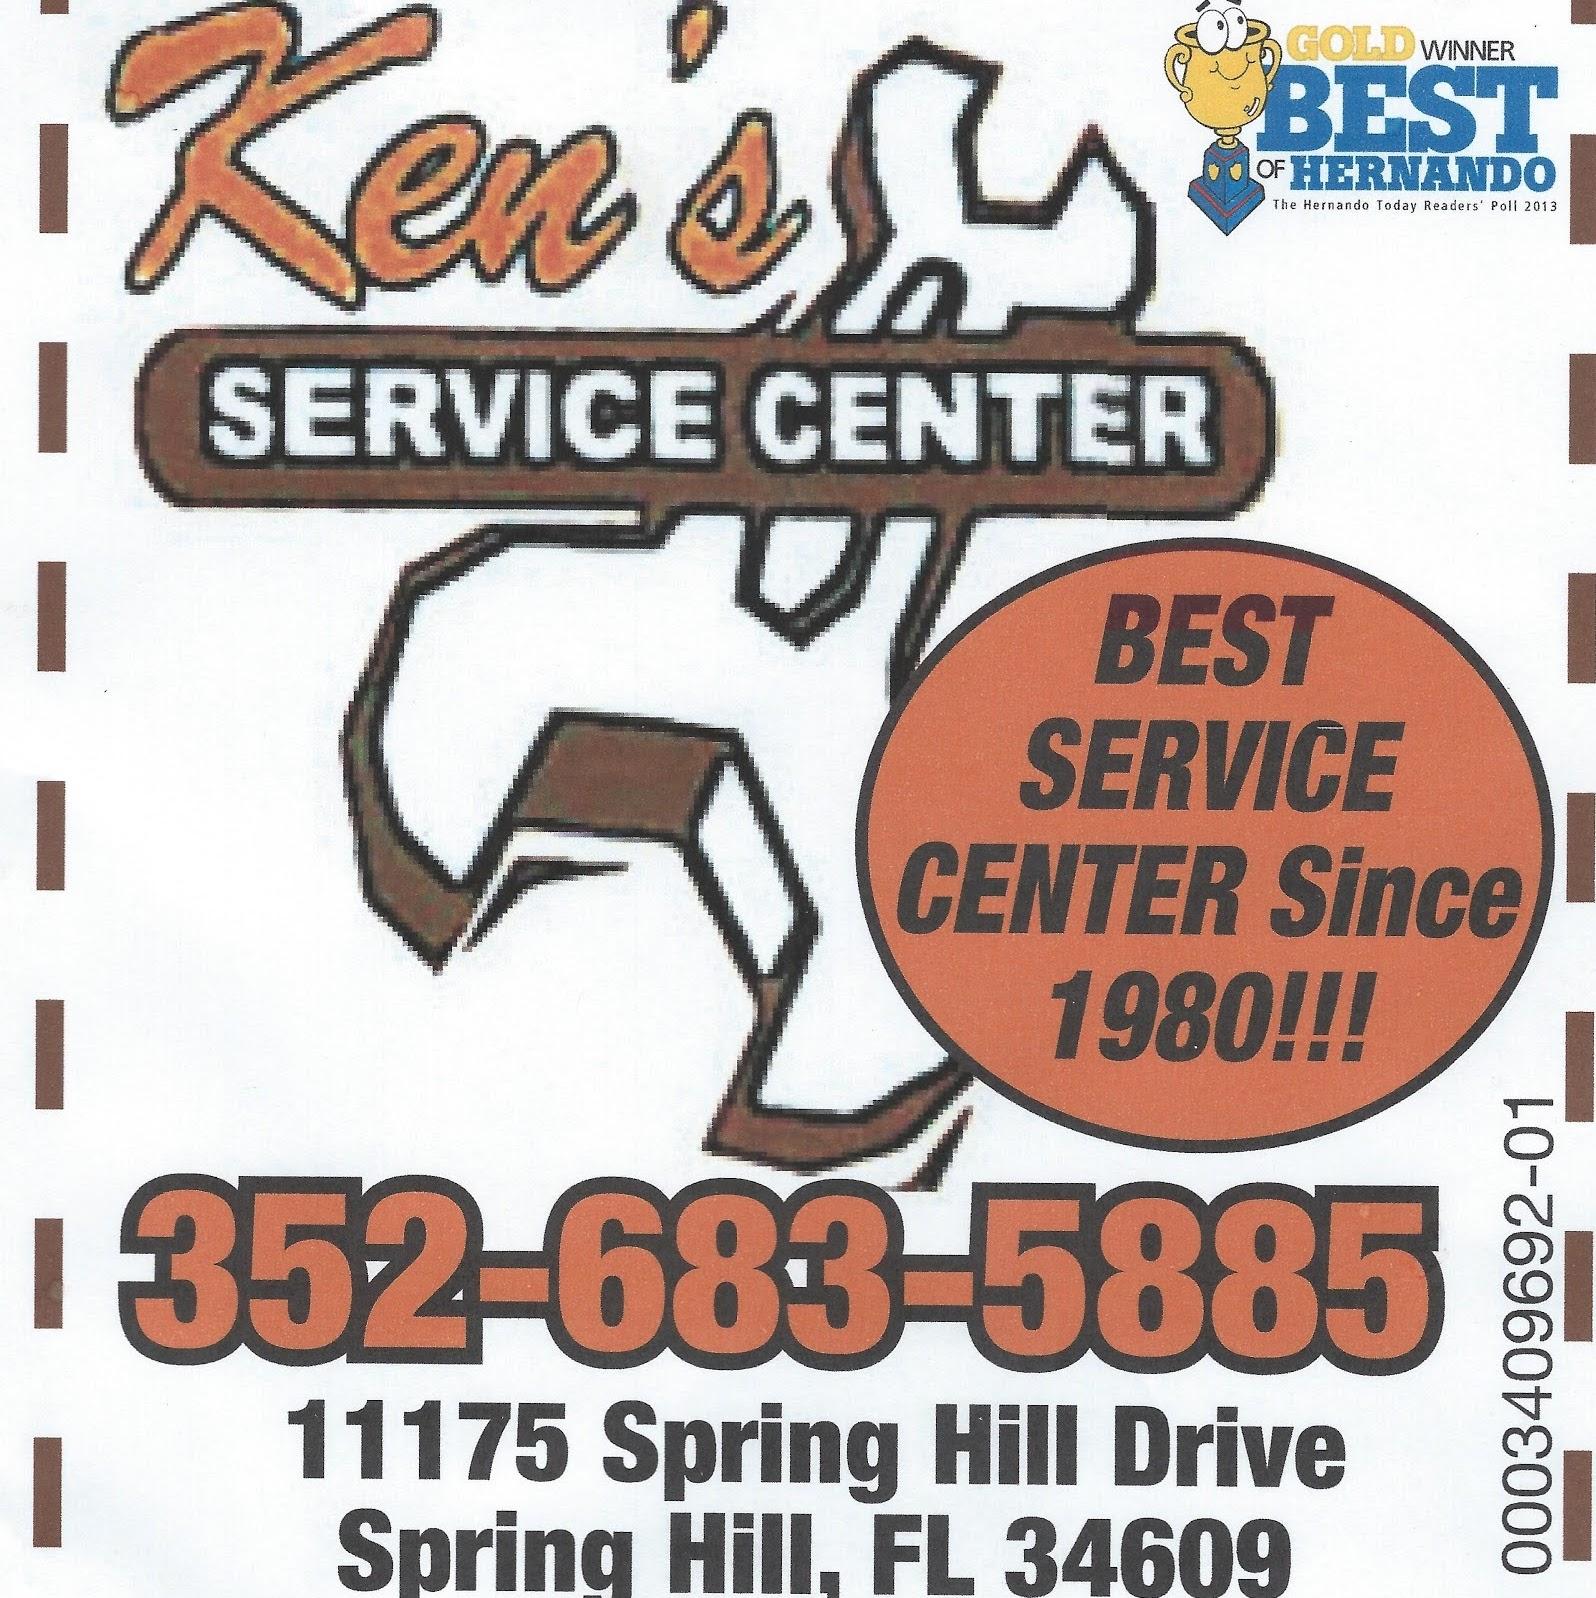 Ken's Spring Hill Services Center